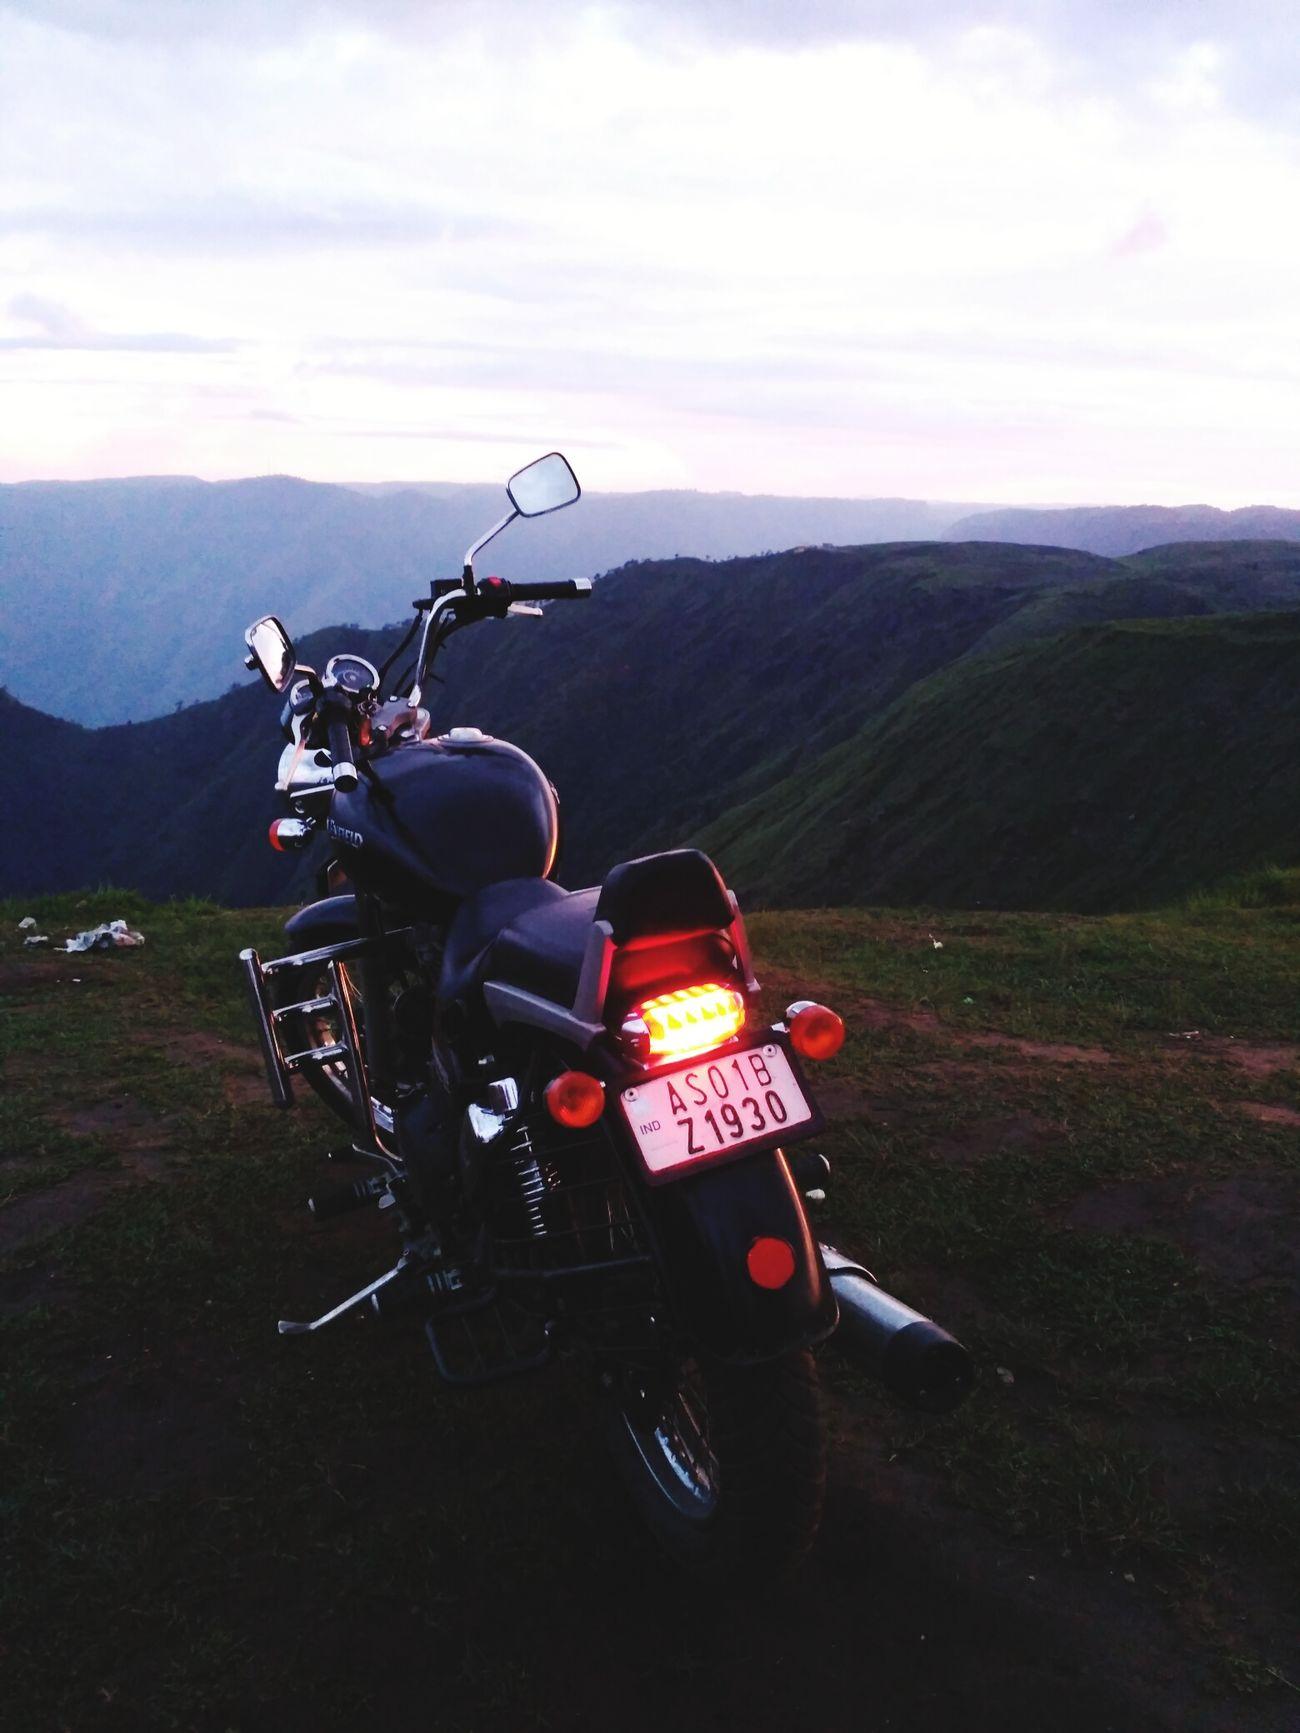 Motorcycle Riding Hilltop Laitlum Shillong